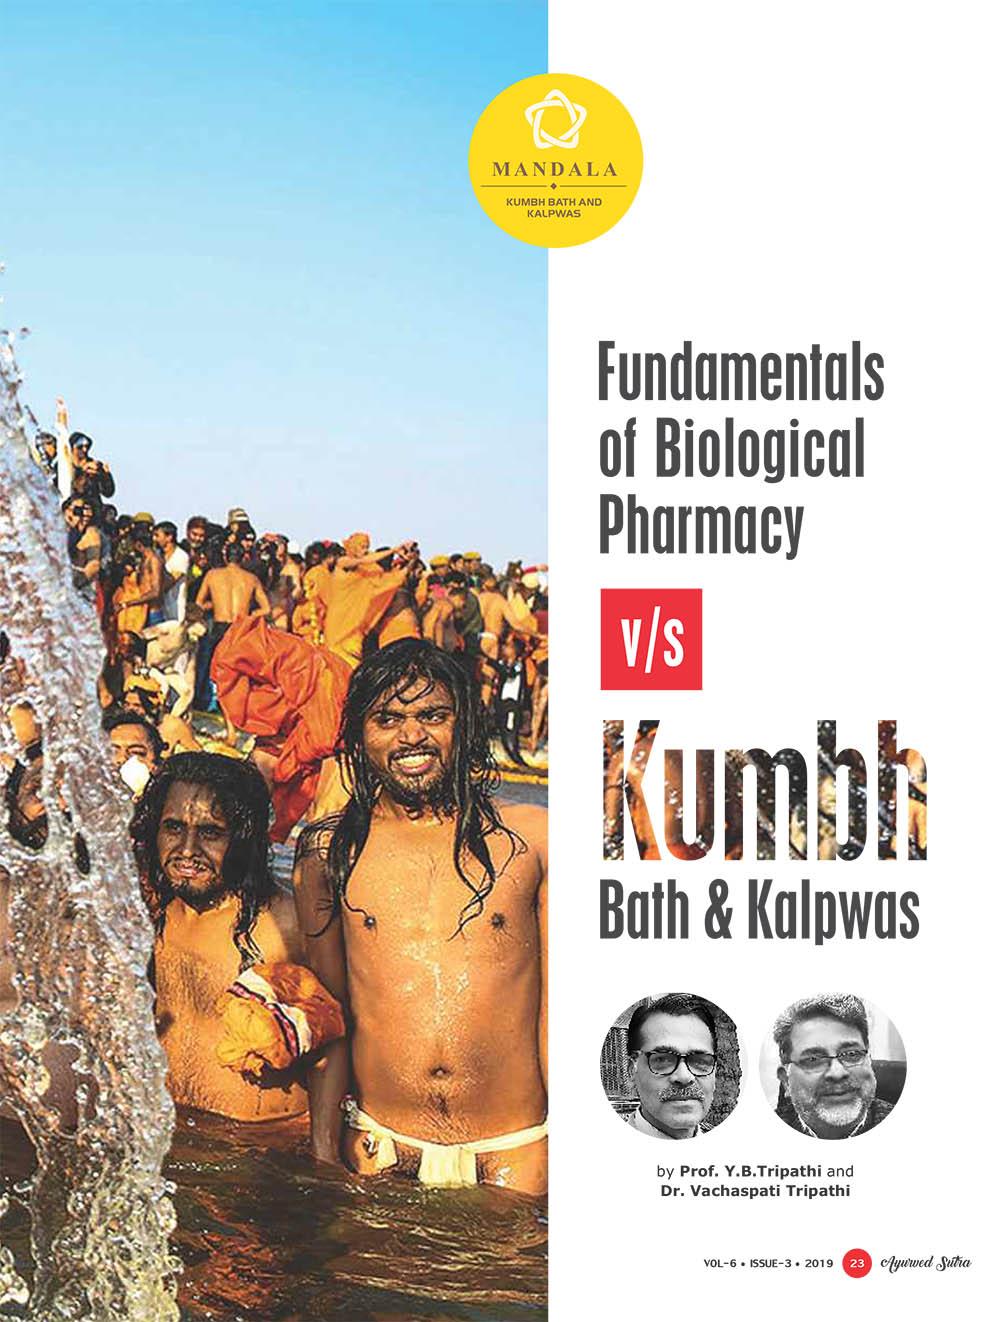 Ayurvedsutra Vol 06 issue 01 02 25 - Fundamentals of Biological Pharmacy v/s Kumbh Bath & Kalpwas